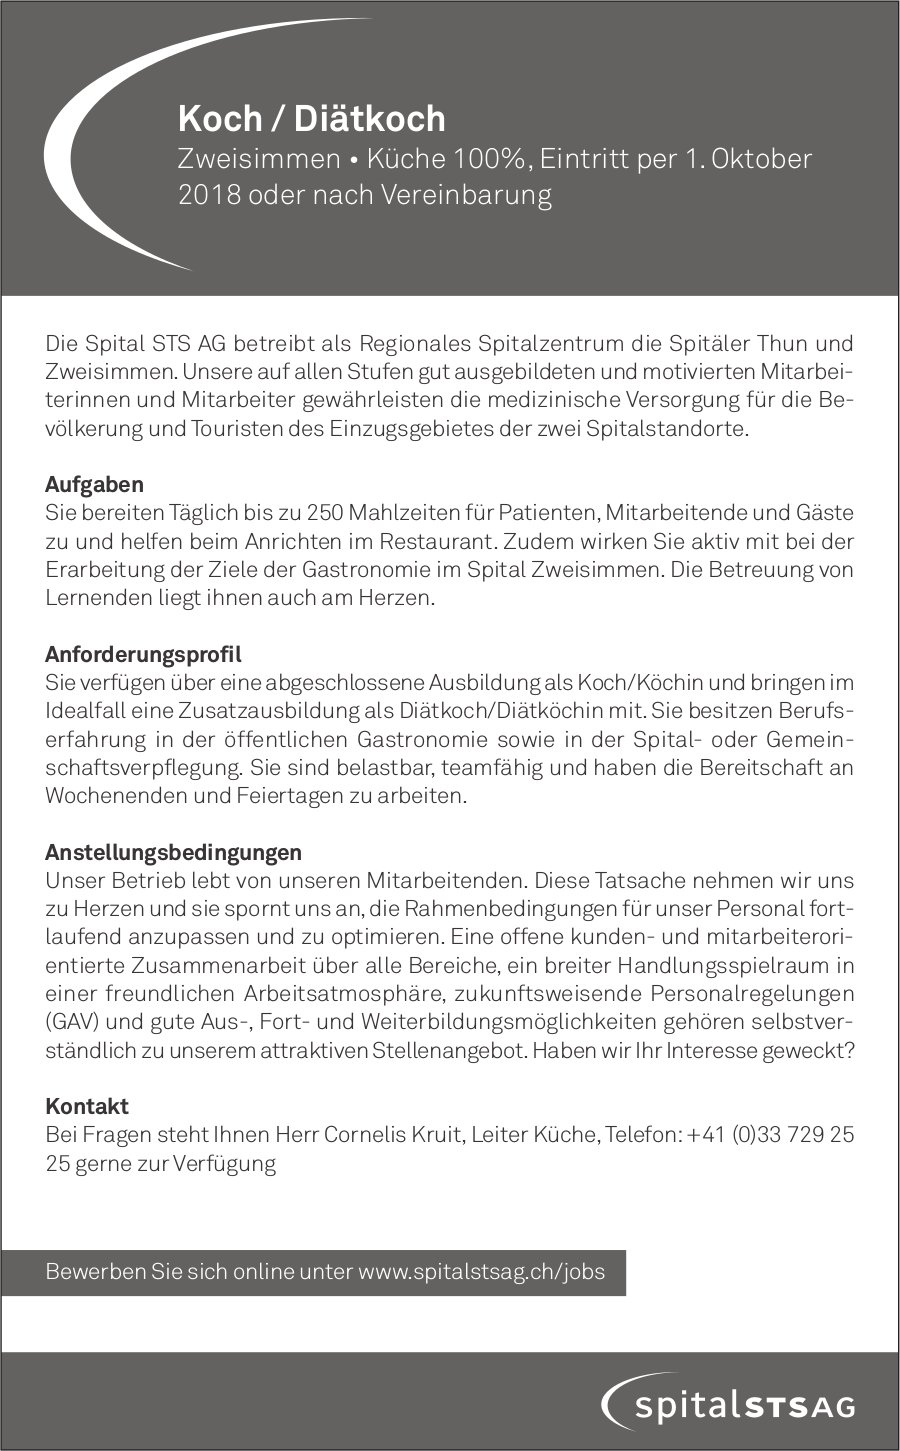 Koch / Diätkoch in Zweisimmen gesucht, Spital STS AG